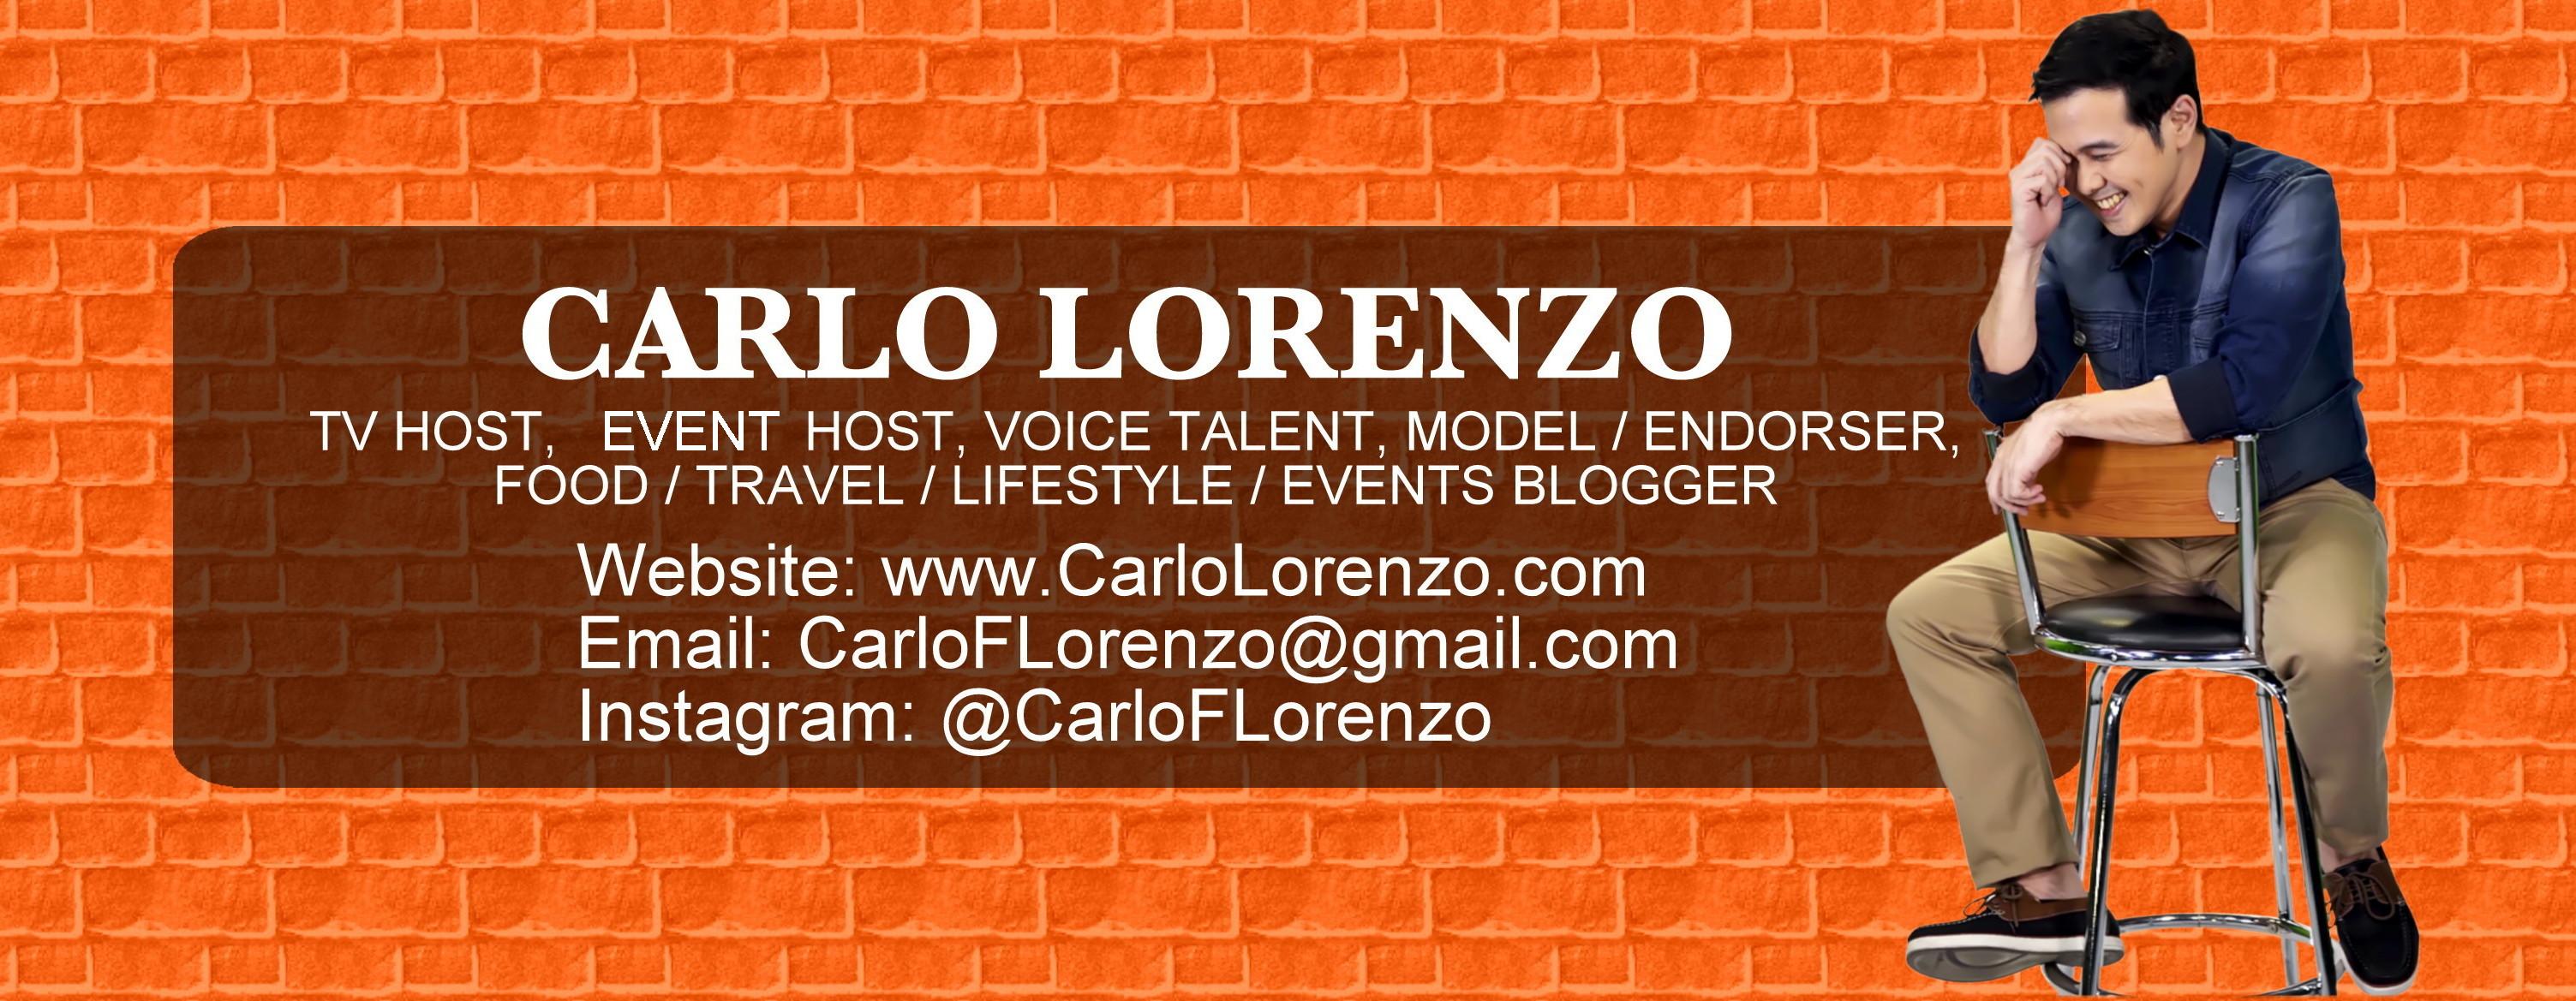 Resume – Carlo Lorenzo